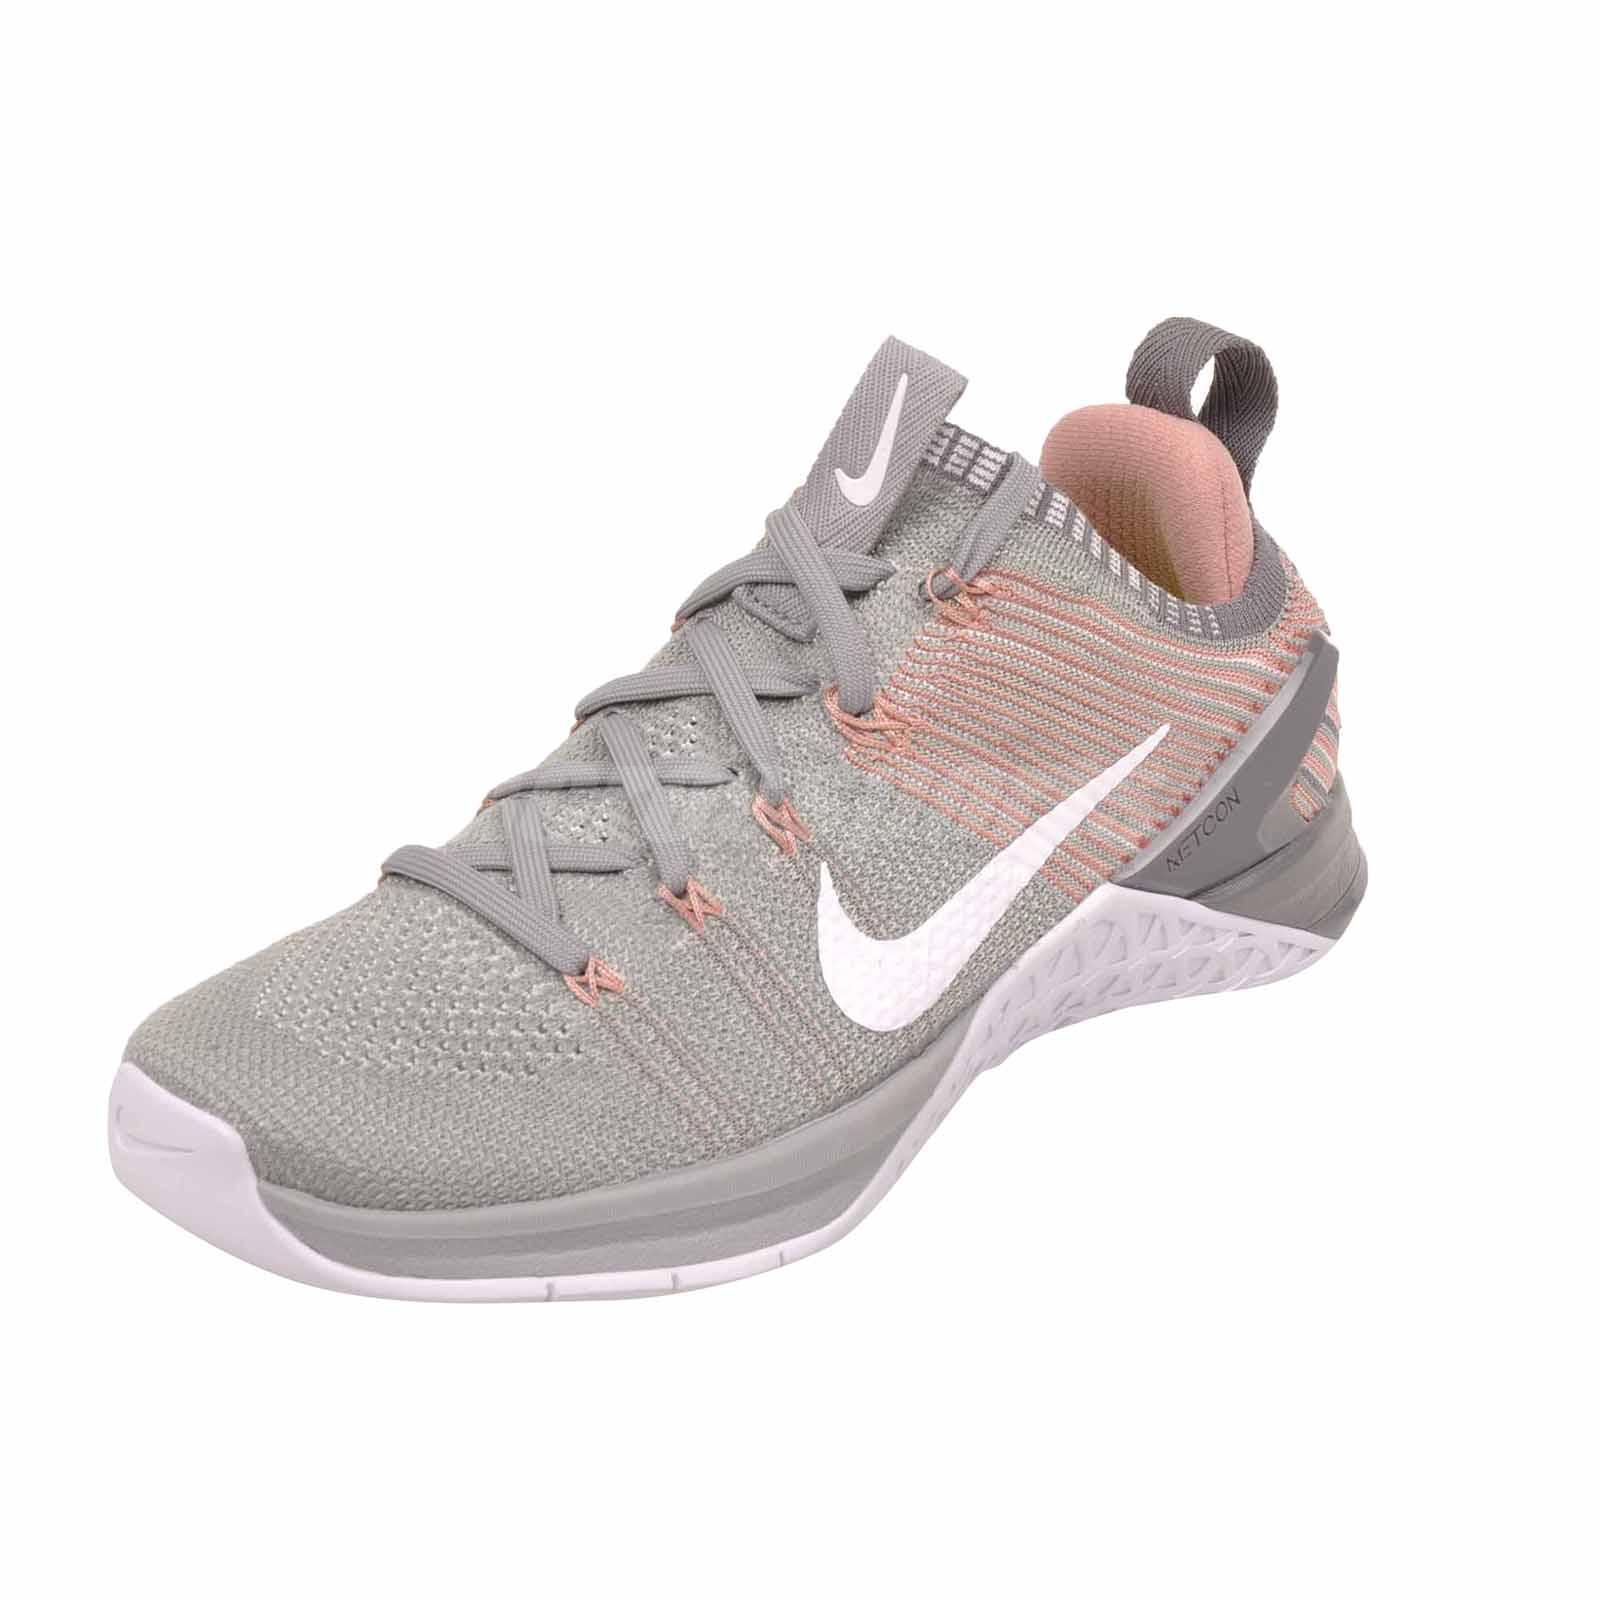 6a337664df4e9 Nike Wmns Metcon DSX Flyknit 2 Cross Training Womens Shoes Silver ...